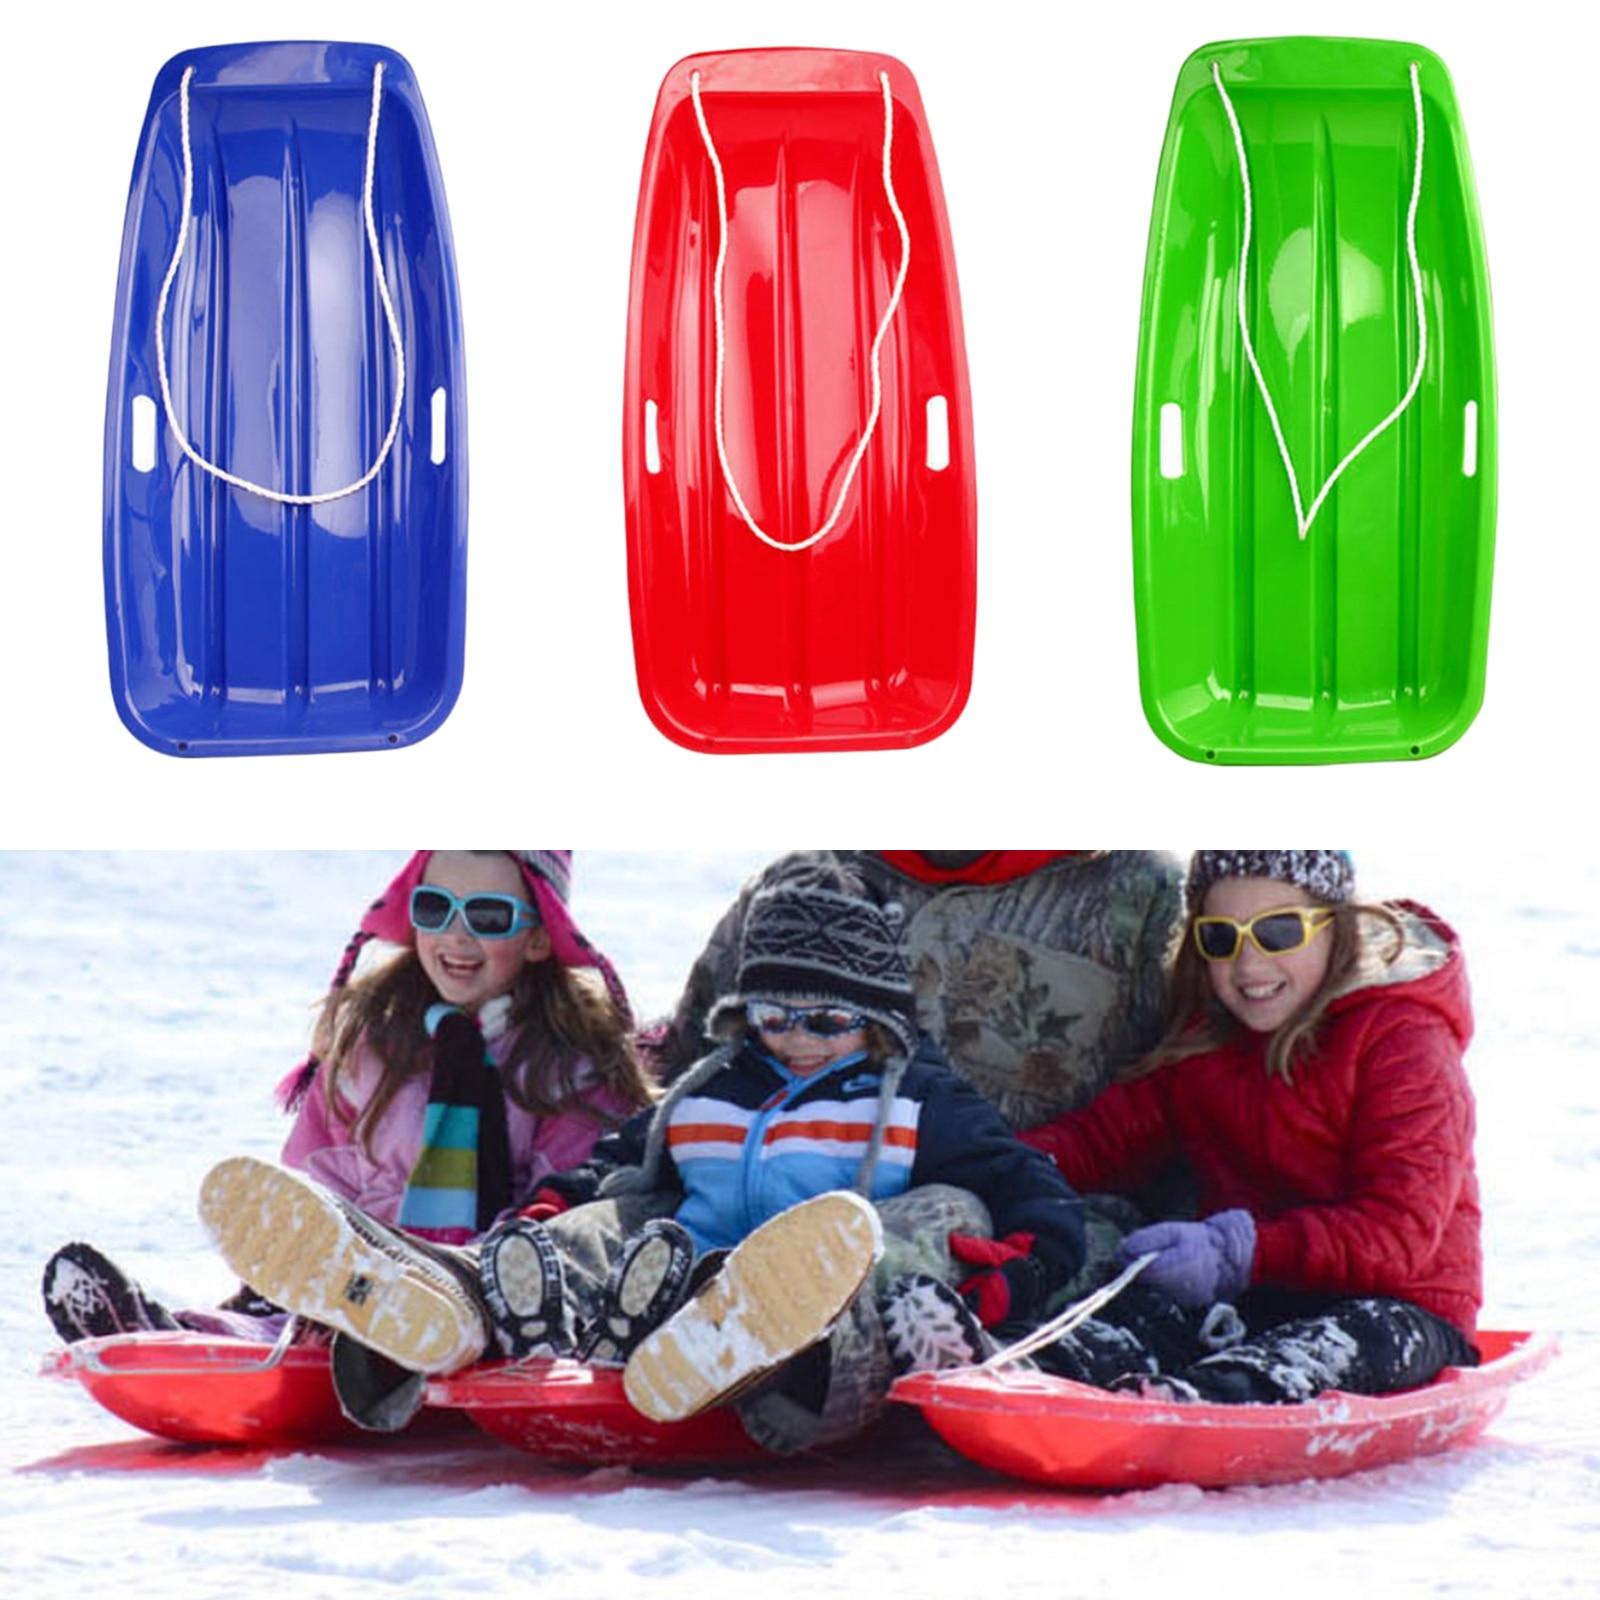 Snow Sled Sledge Skiing Toboggan Board Sleigh Outdoor Ski Luge Supplies for Kids